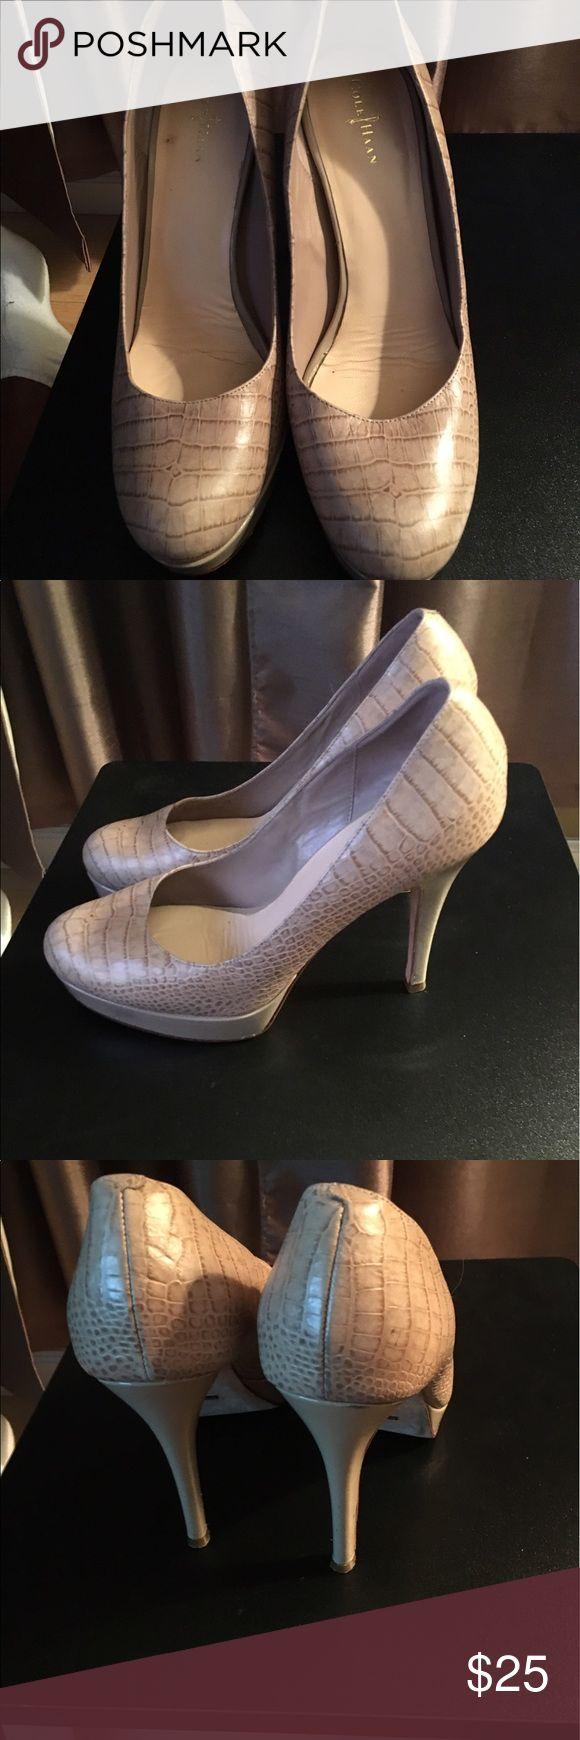 Cole Haan high heeled shoe Neutral, platform leather high heel shoe with croc detail. Cole Haan Shoes Heels